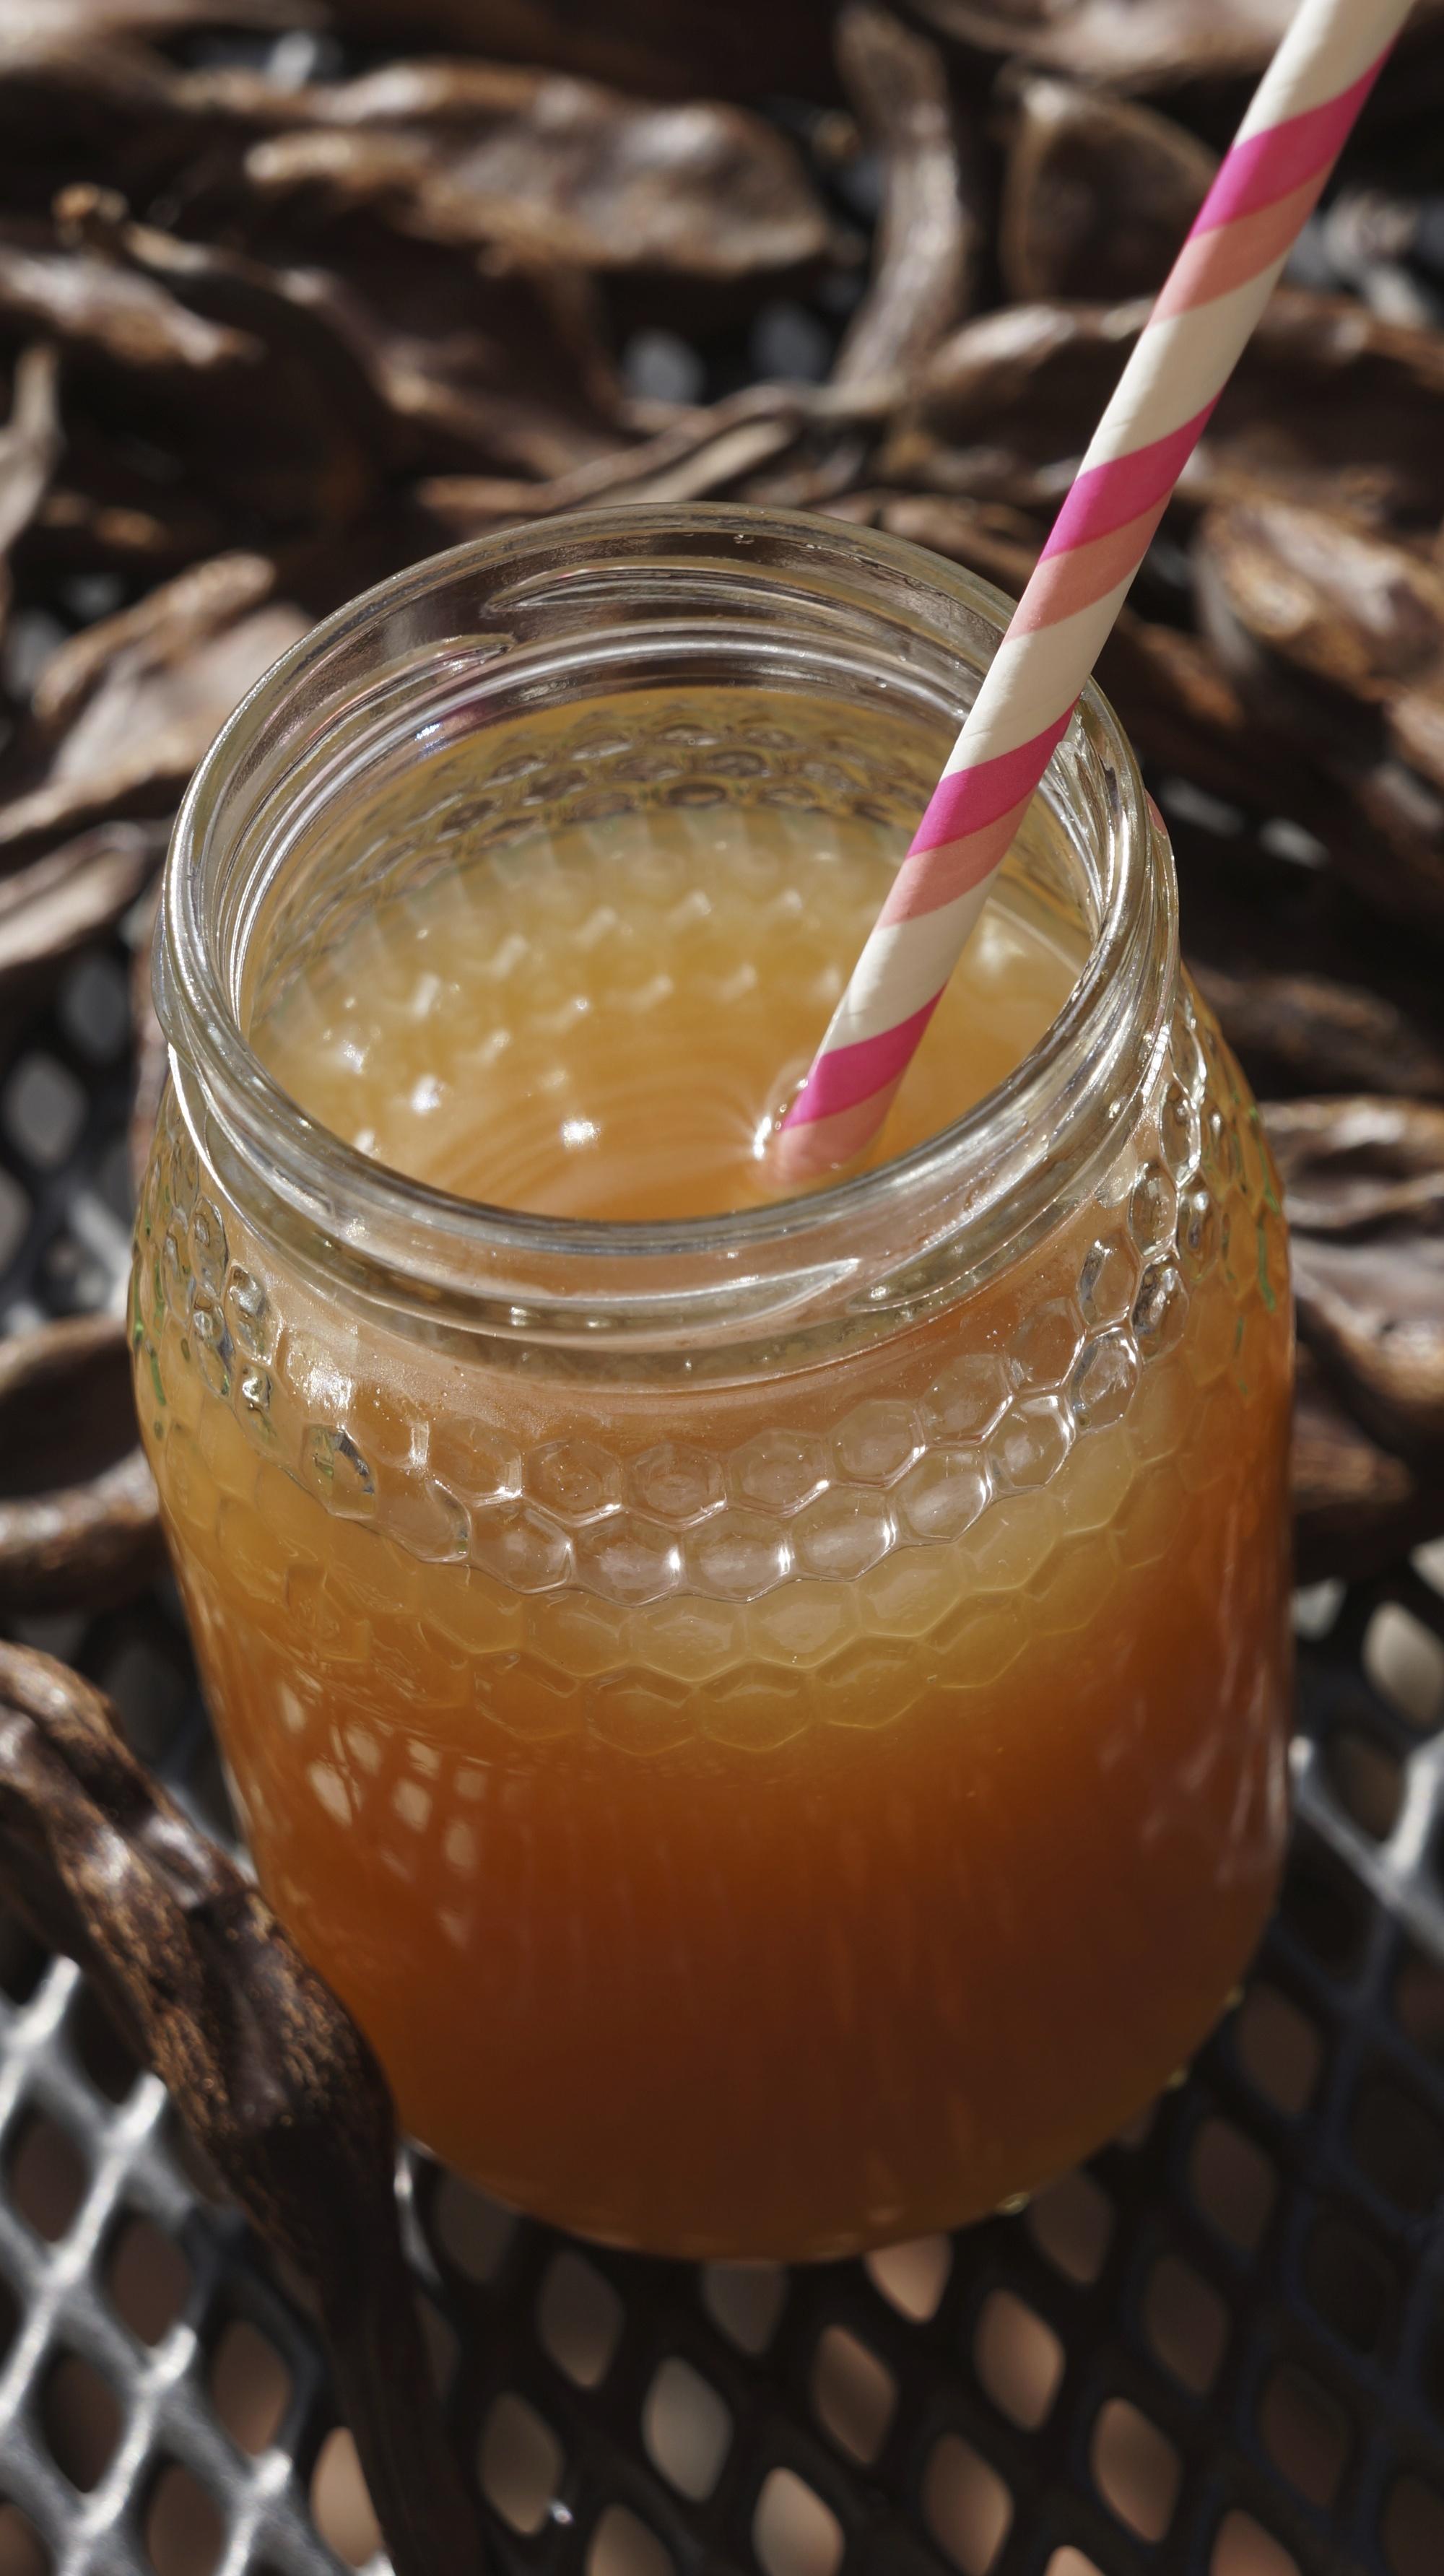 Receta#3 - Bebida frîa de Algarrobo